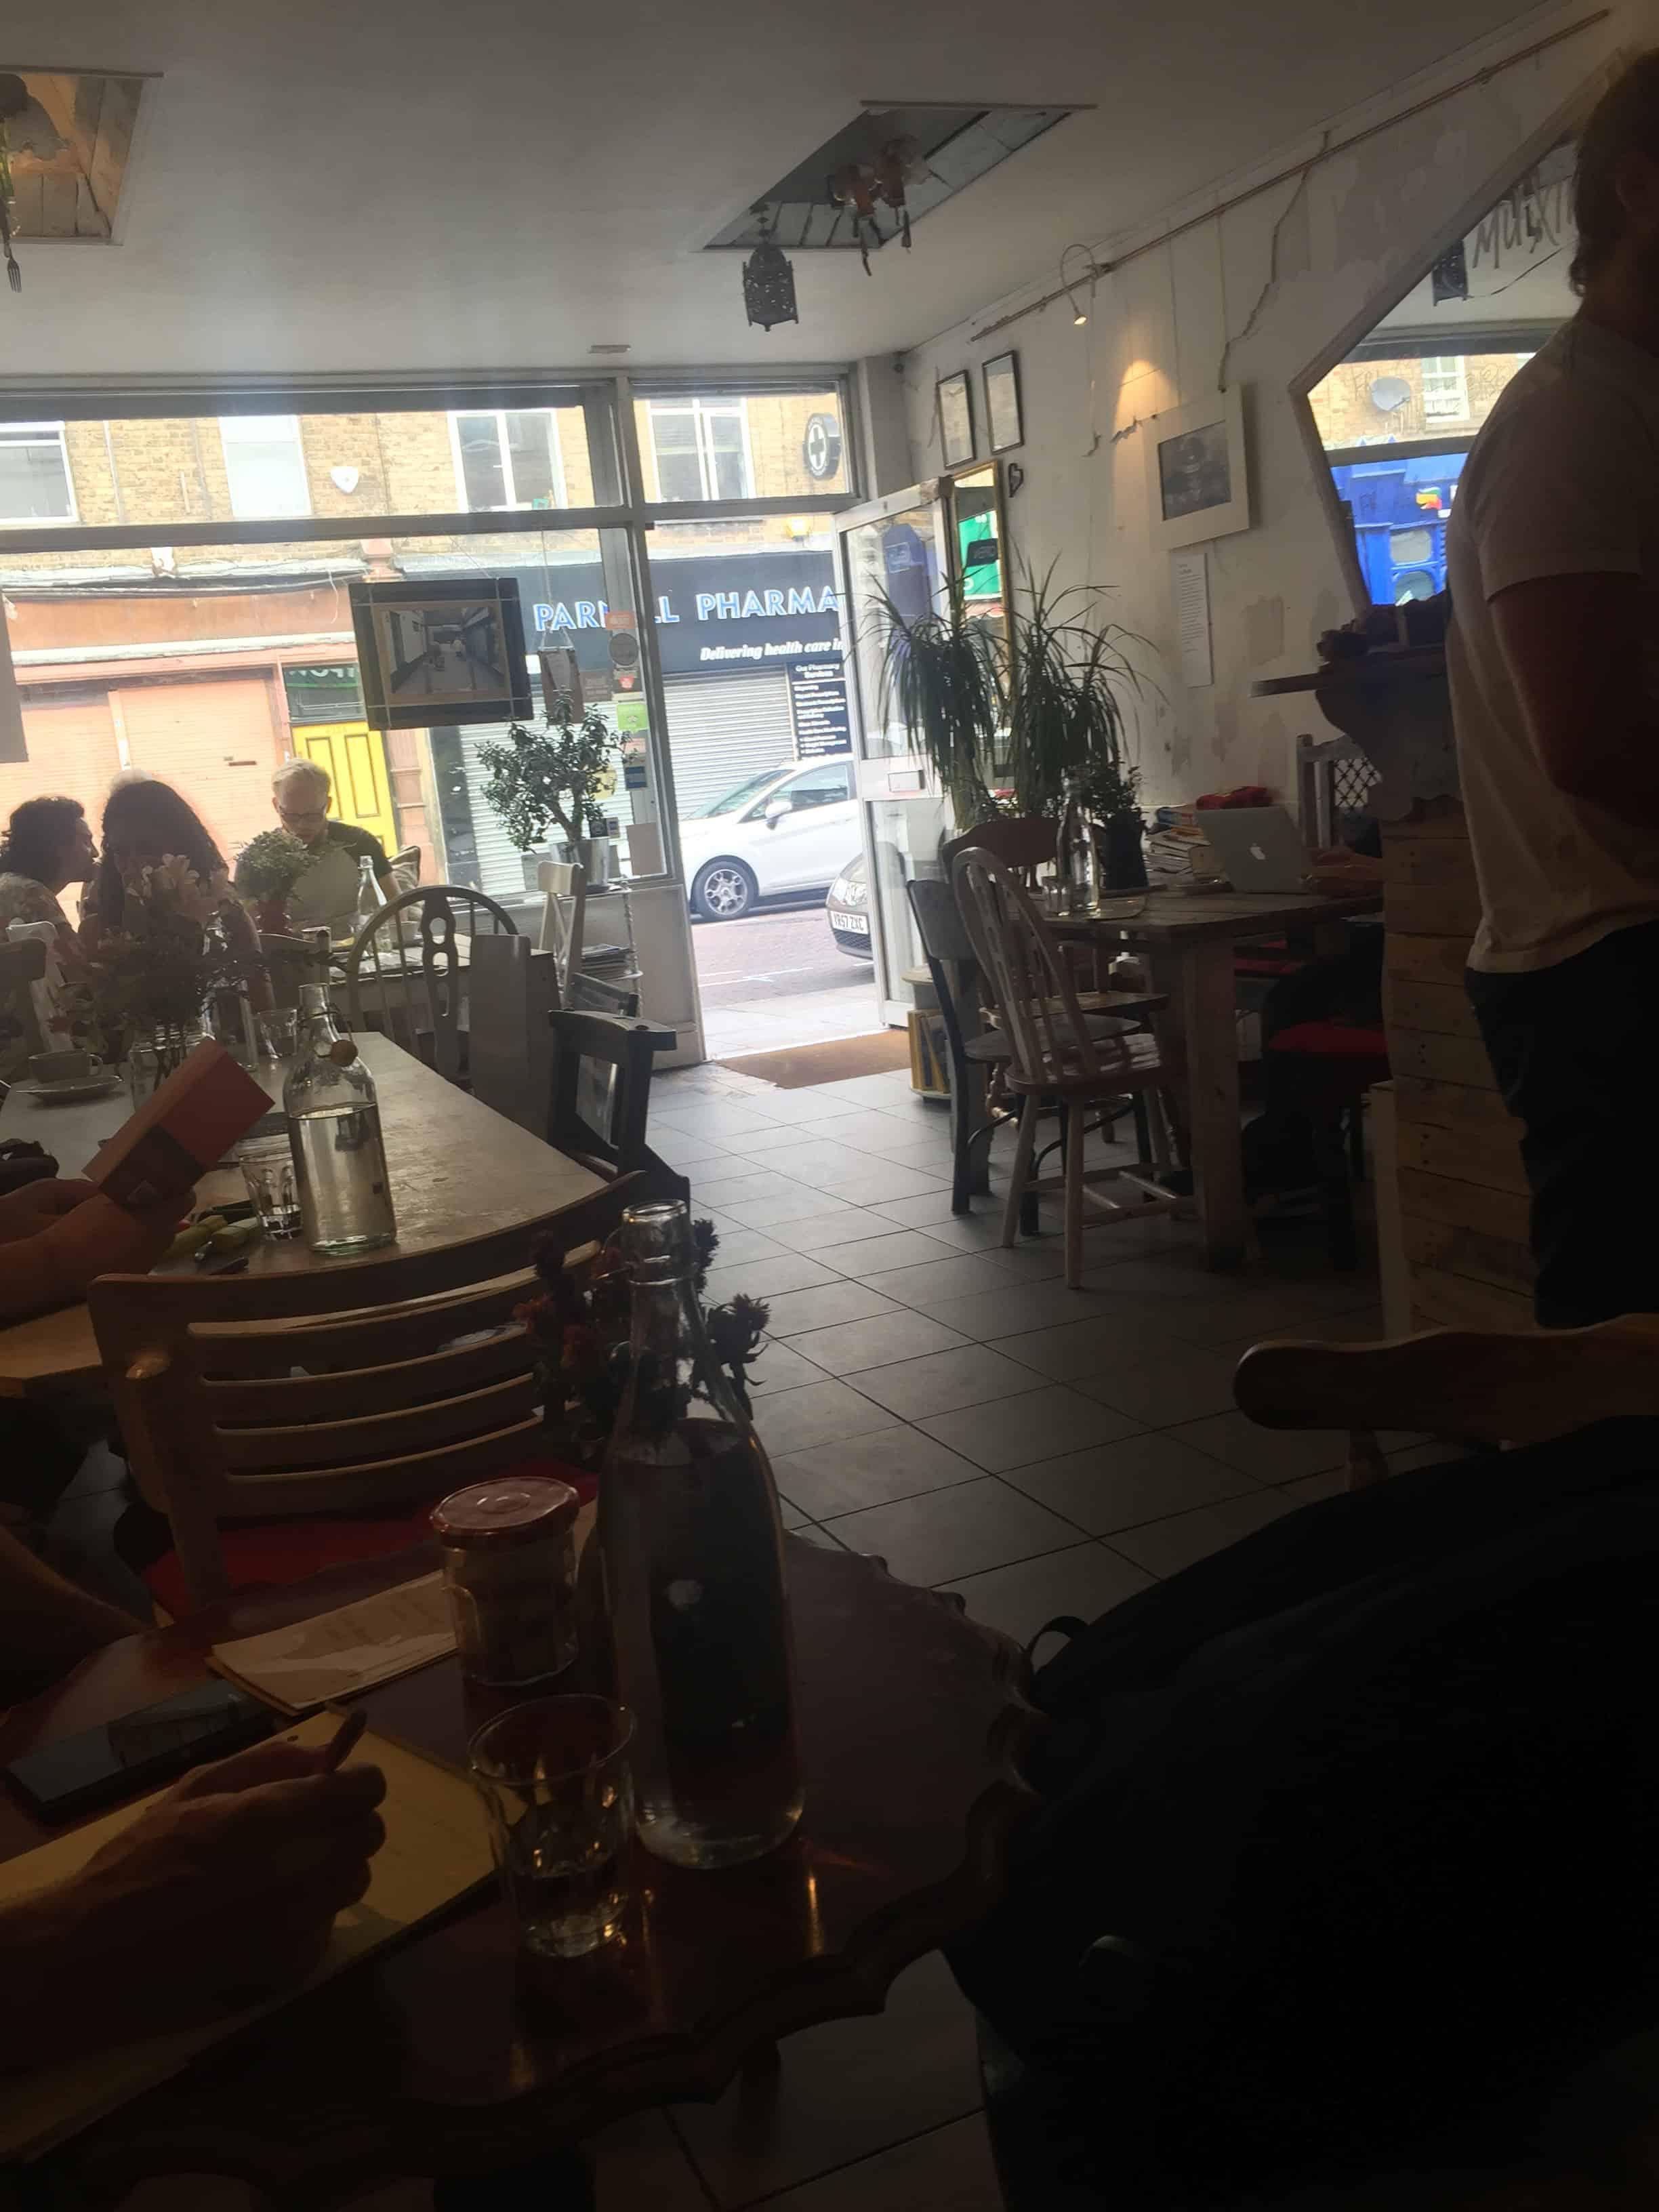 Tota Restaurant: Tooting